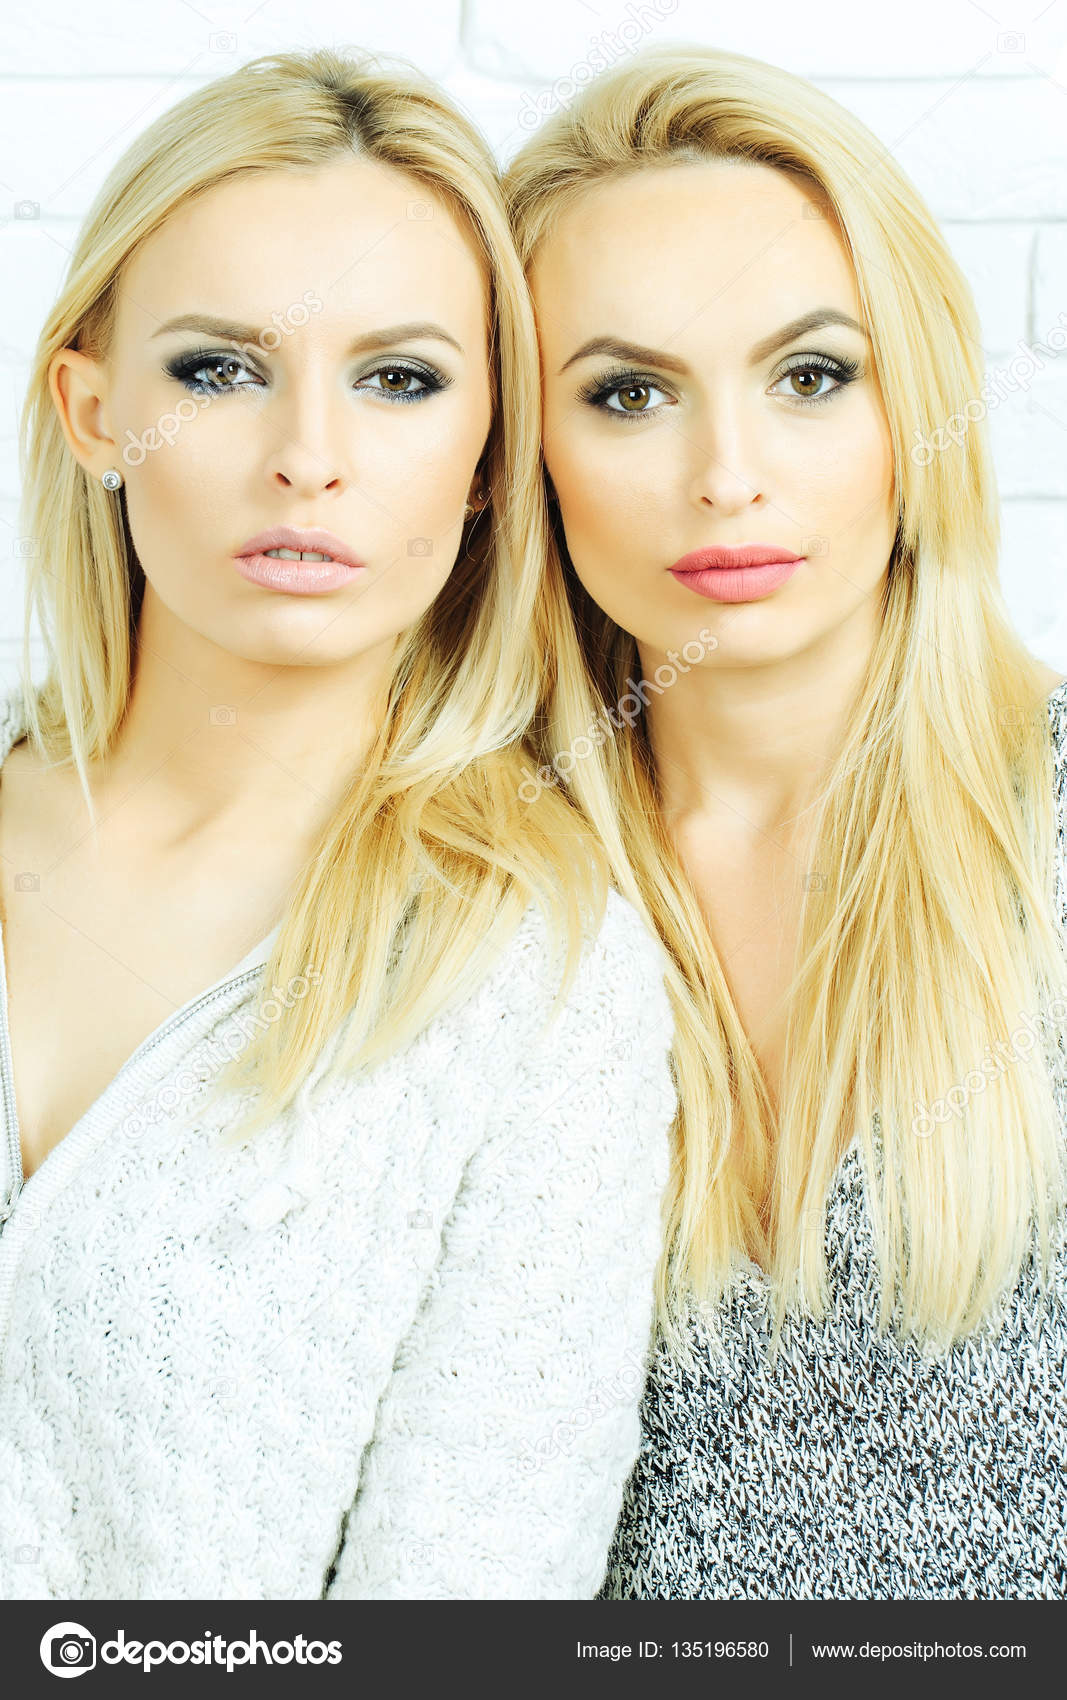 pics of pretty blonde girls